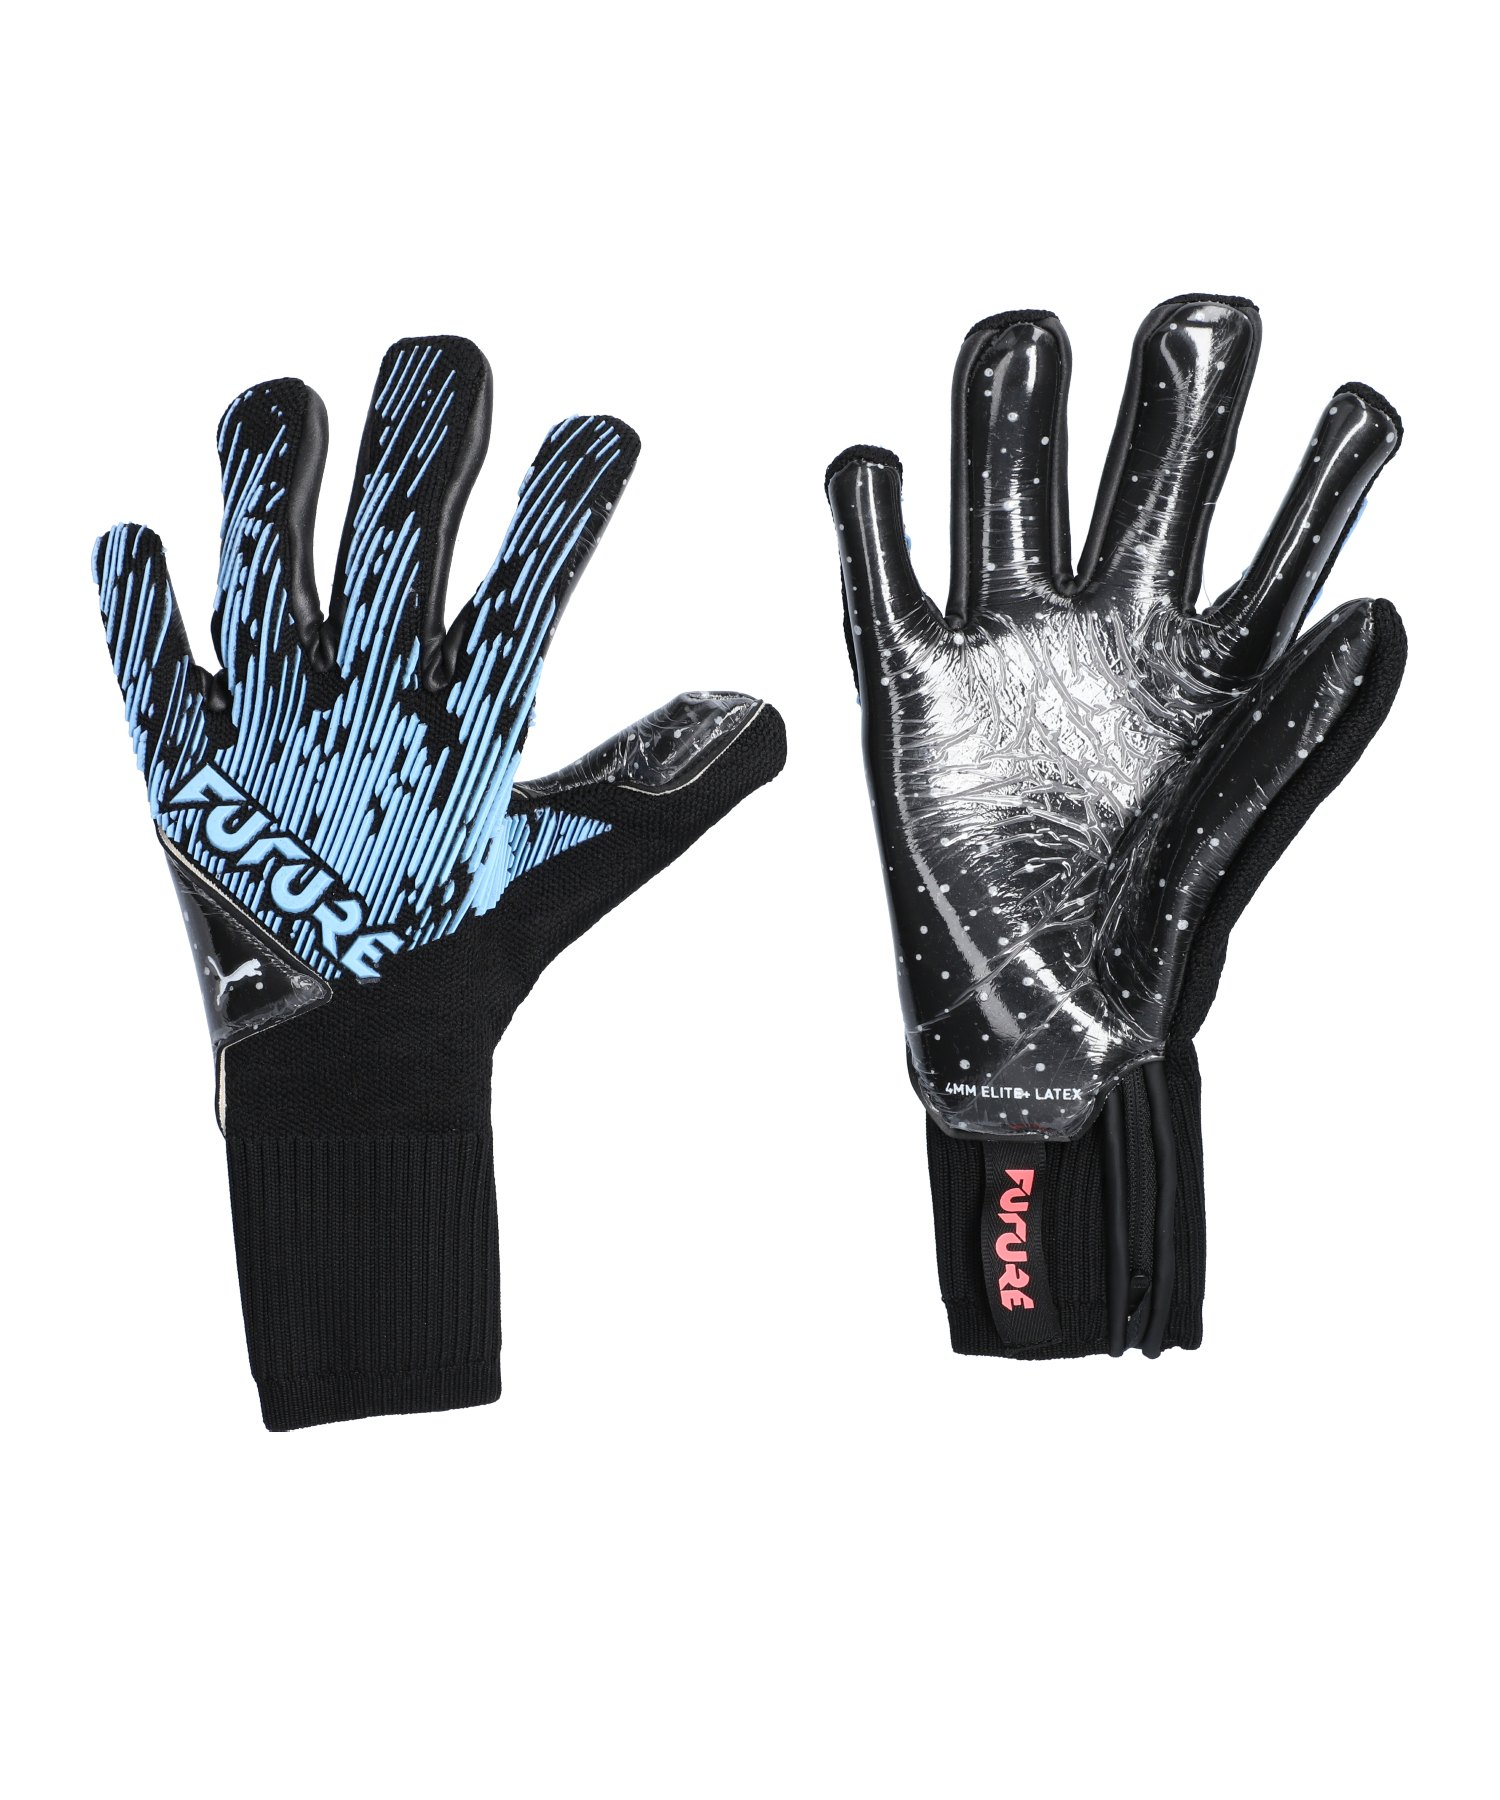 PUMA FUTURE Grip 5.1 Hybrid TW-Handschuh F01 - schwarz